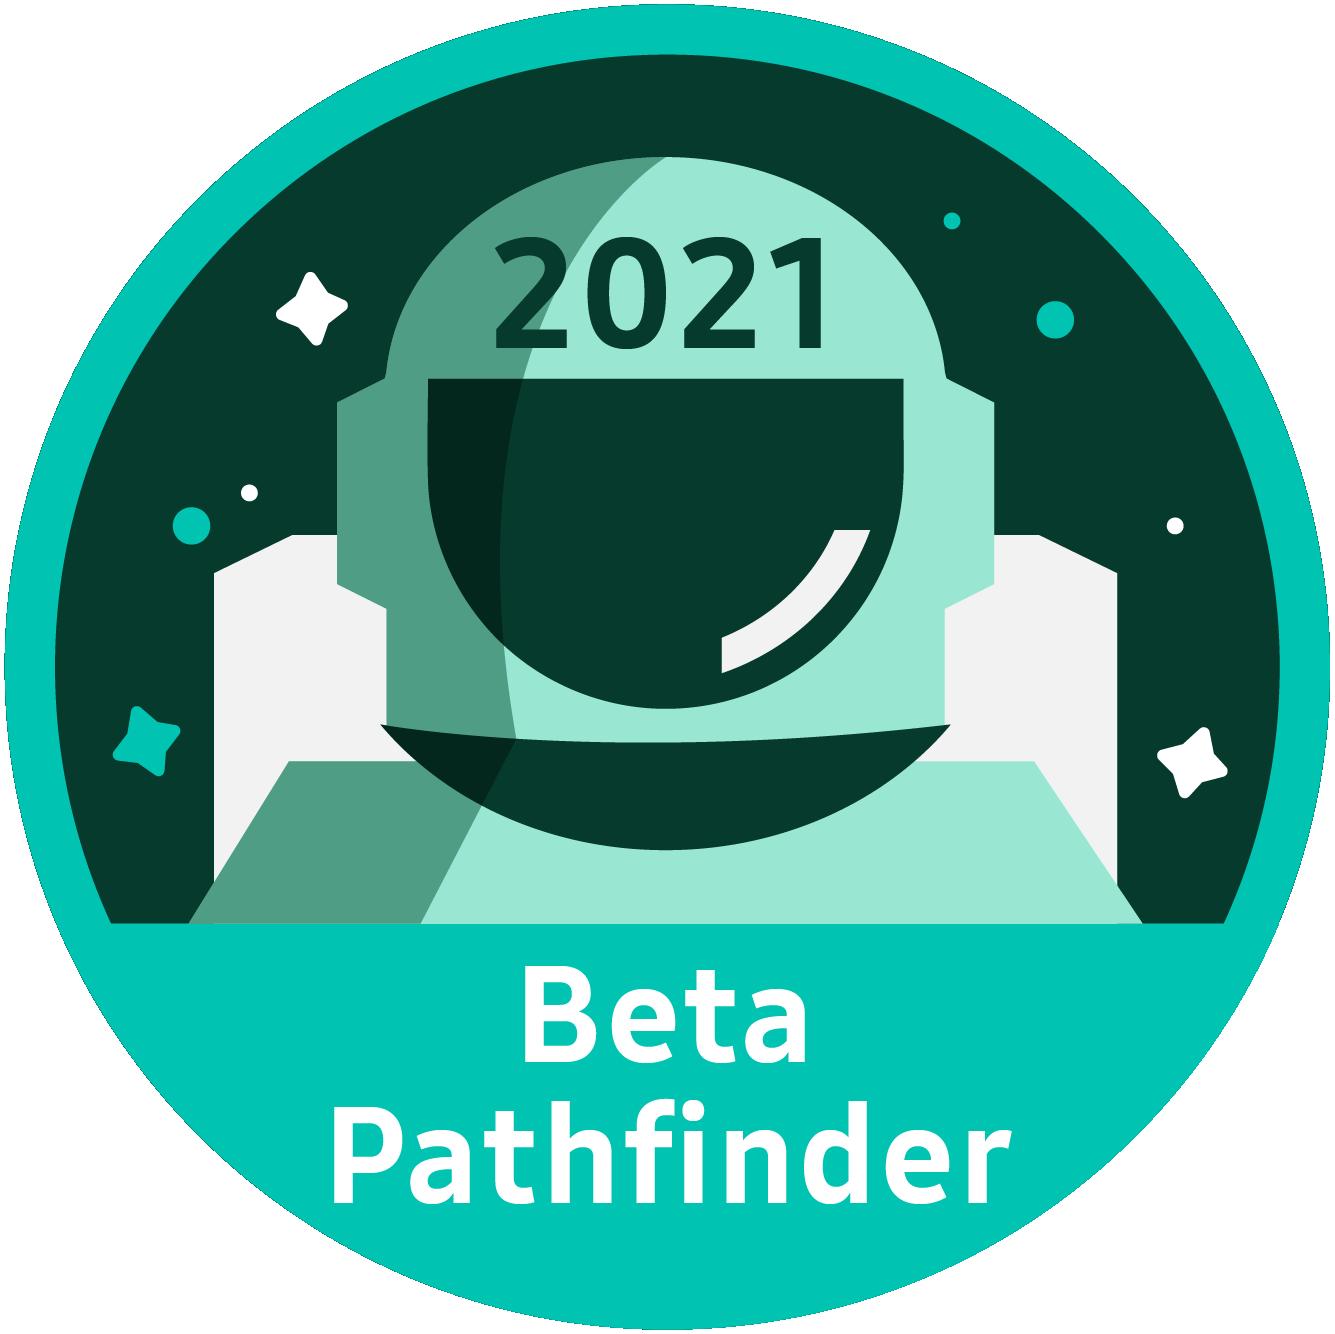 Beta Pathfinder 2021